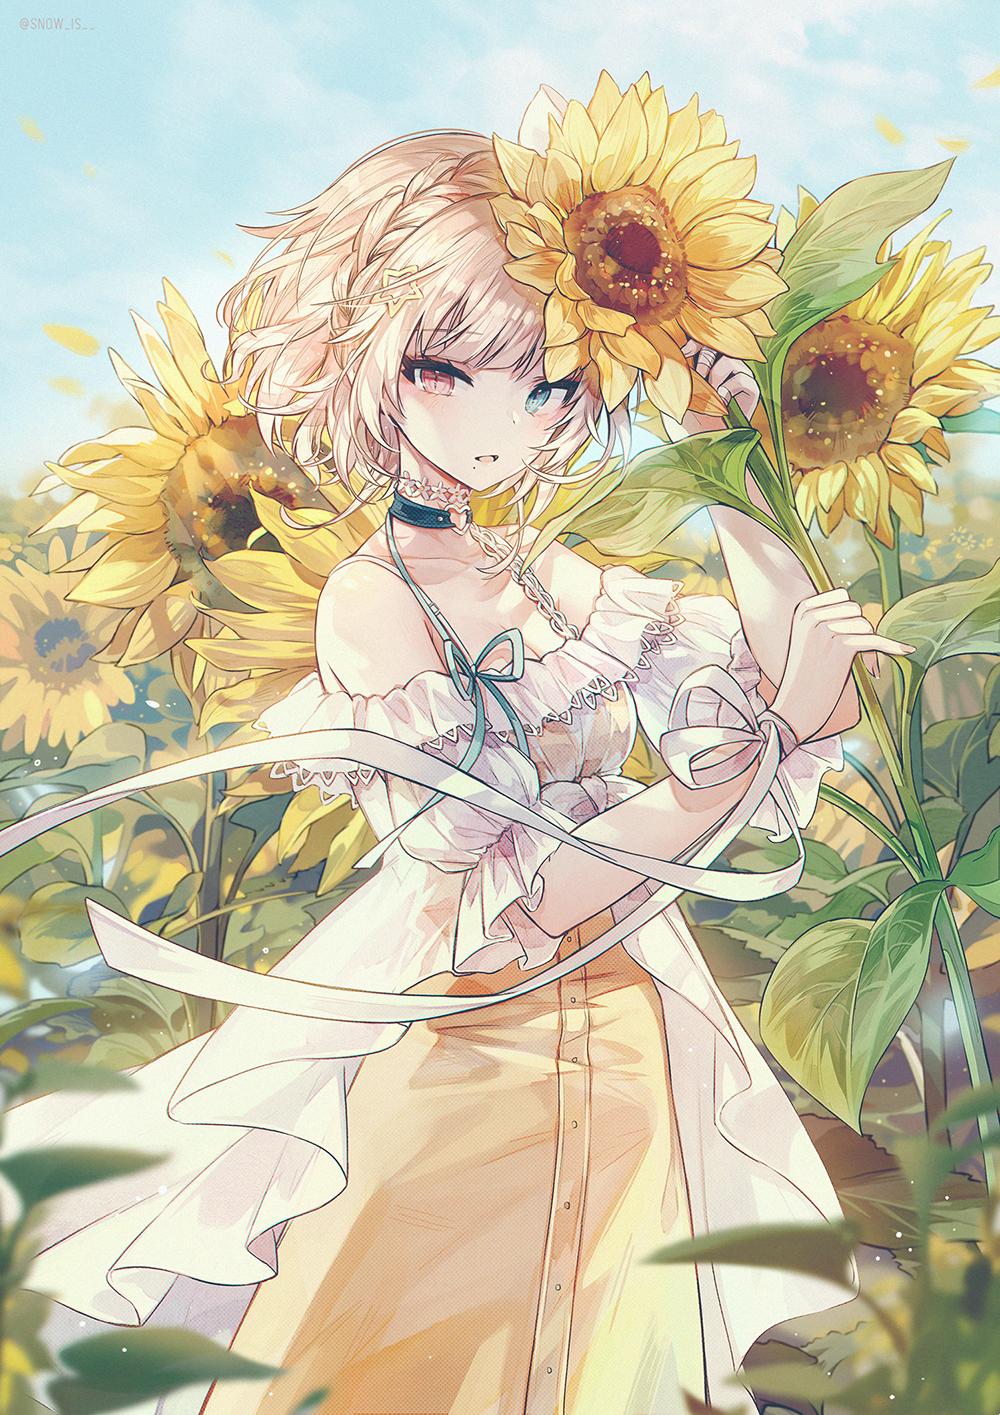 Anime 1000x1415 anime anime girls digital art artwork vertical portrait display short hair blonde blue eyes dress plants flowers sunflowers open mouth